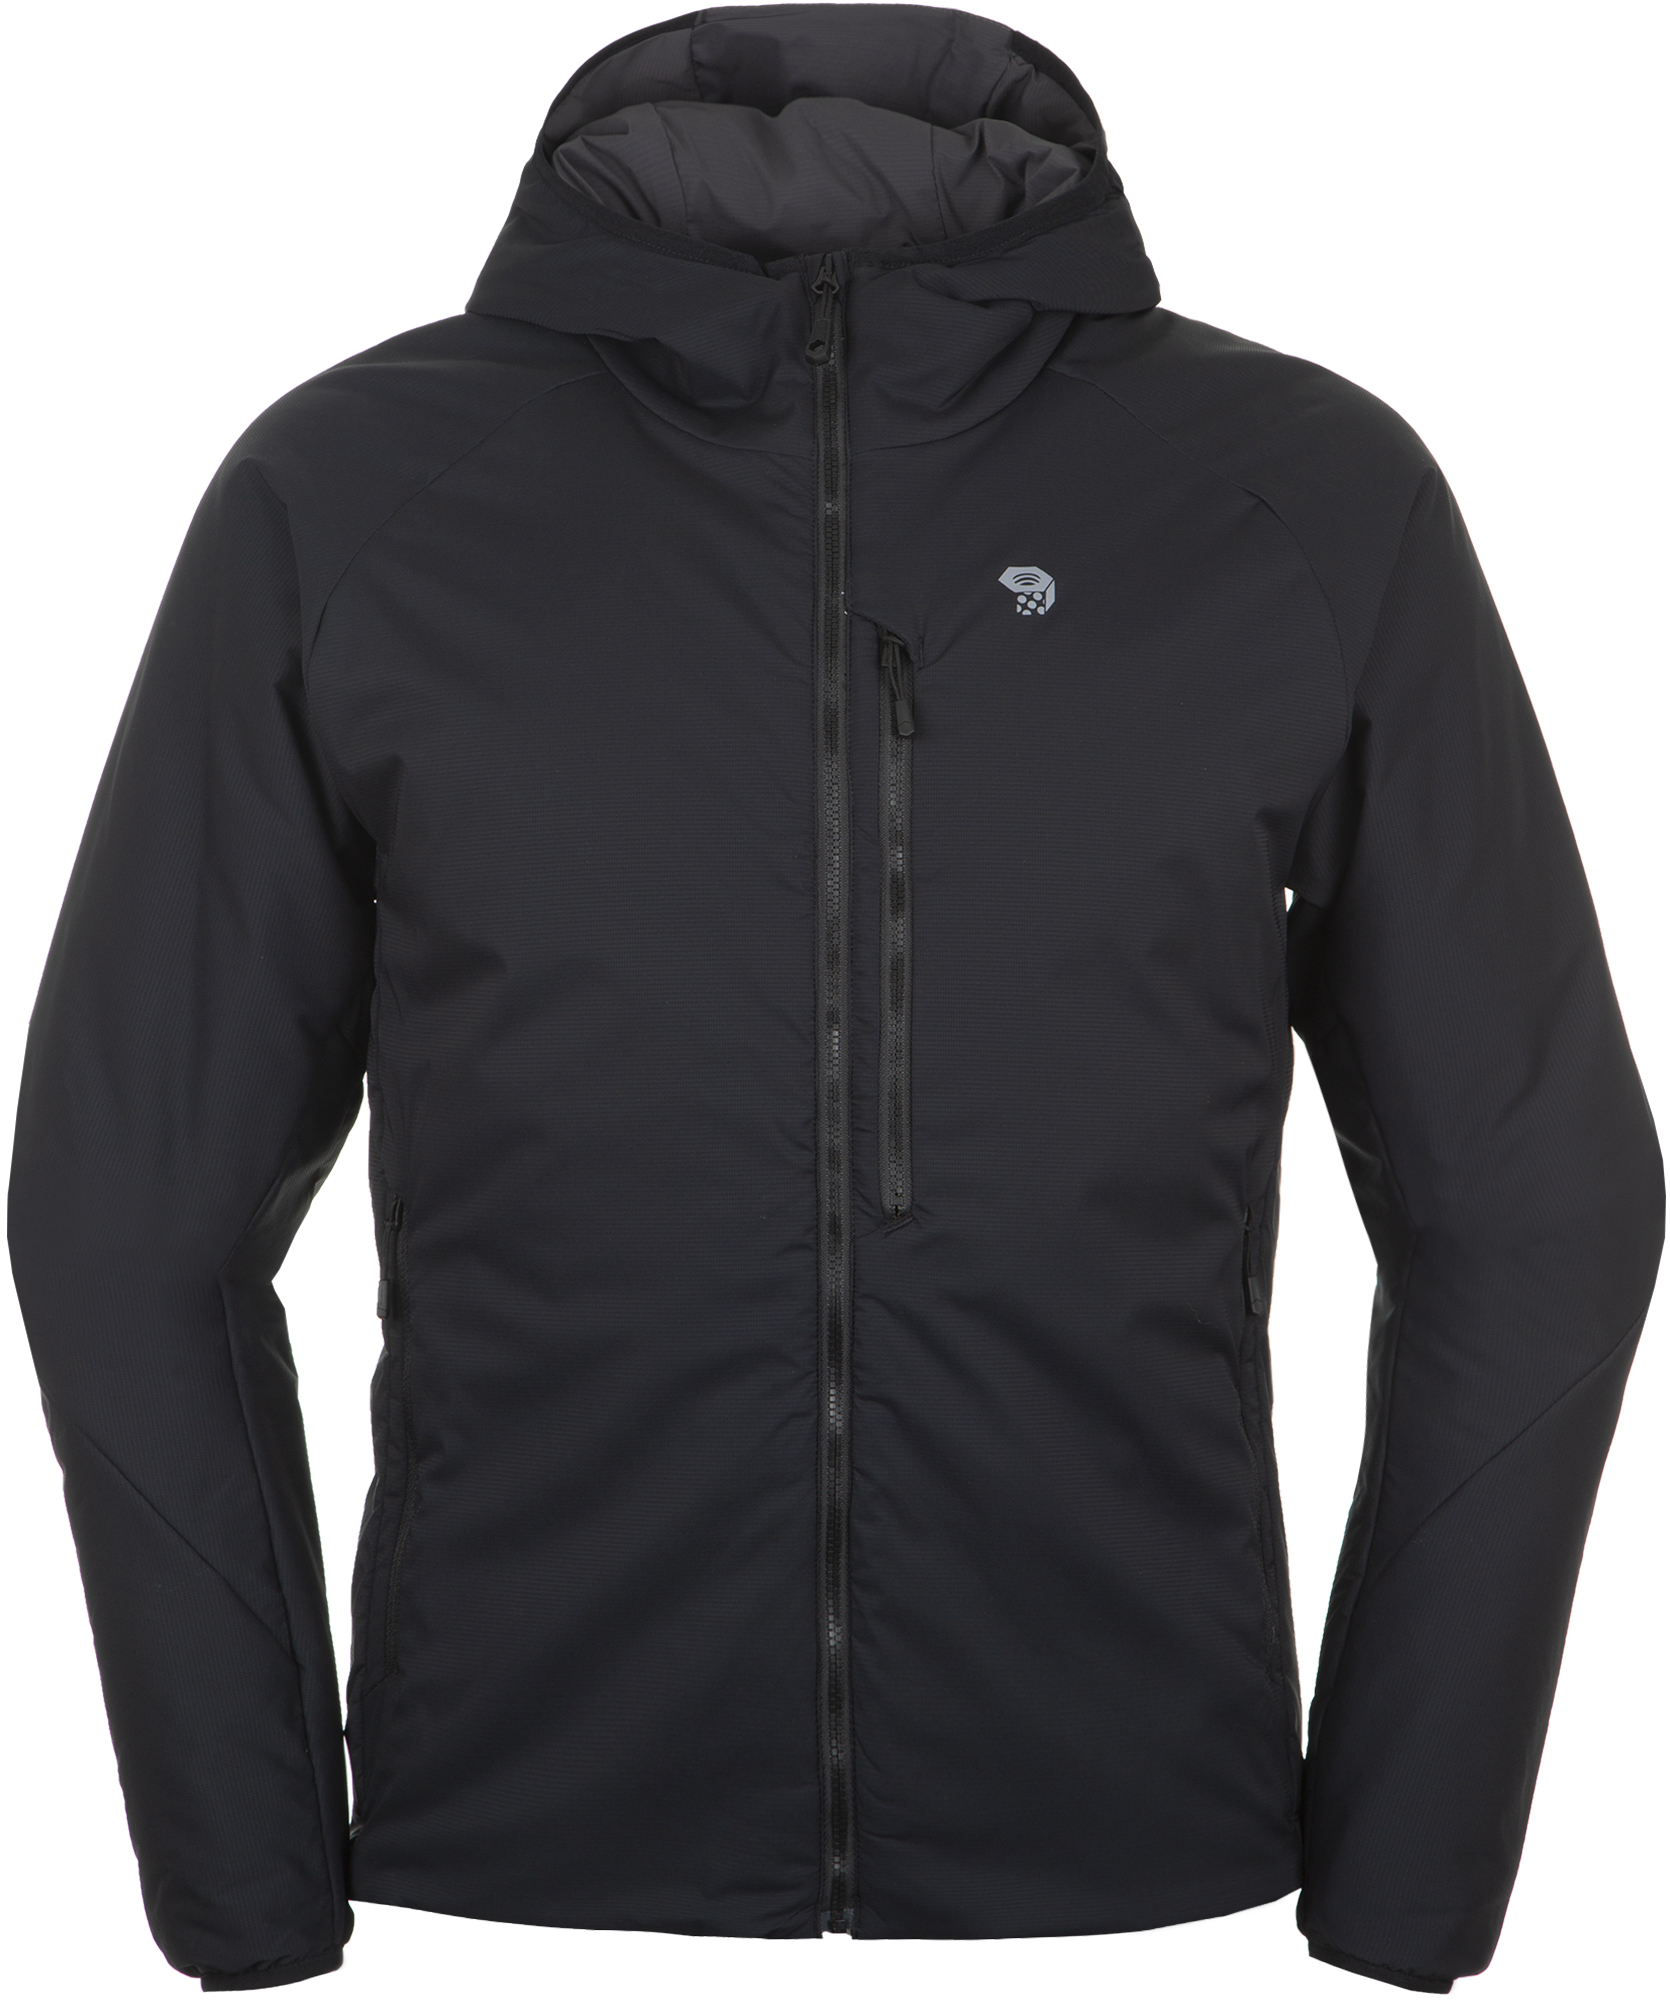 Mountain Hardwear Куртка утепленная мужская Mountain Hardwear Kor Strata, размер 56